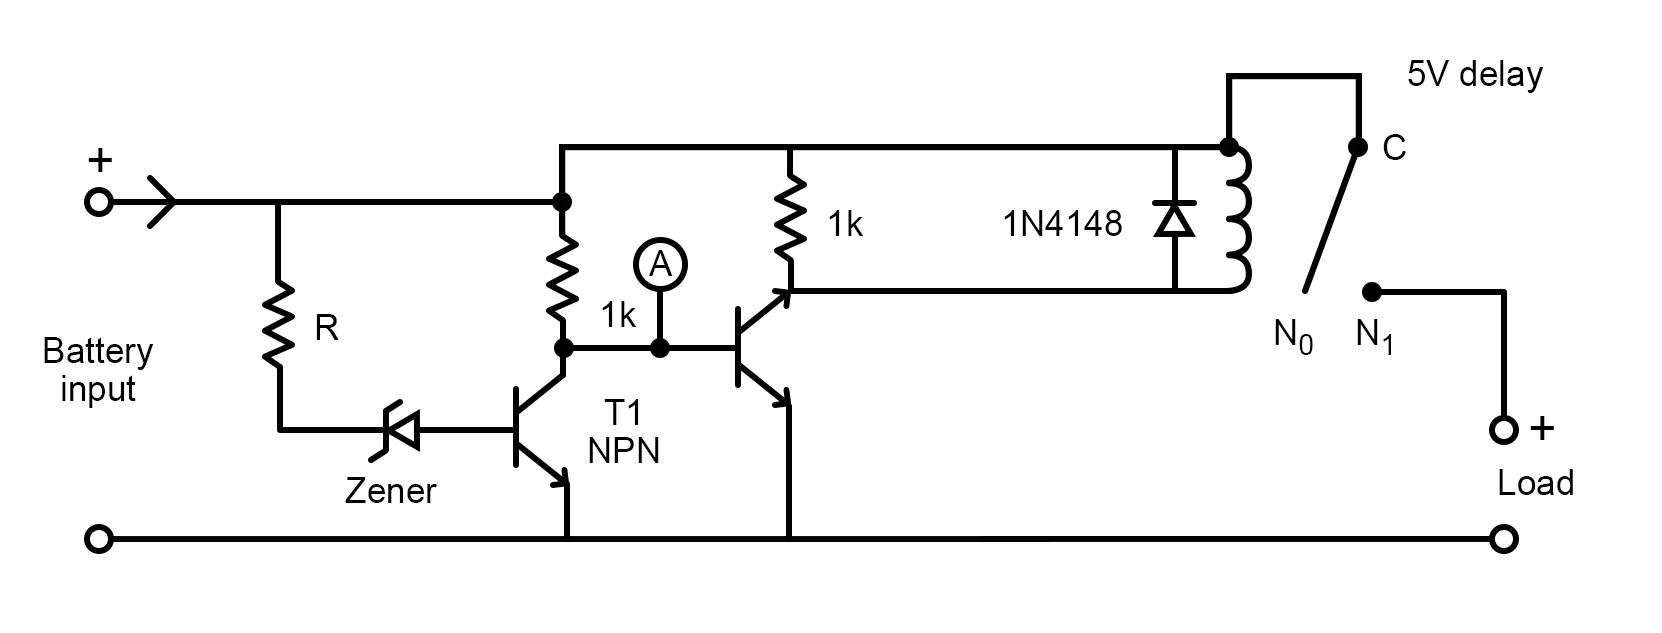 Raspberry_Pi_Lithium_Batteries_DP_MP_image3.jpg